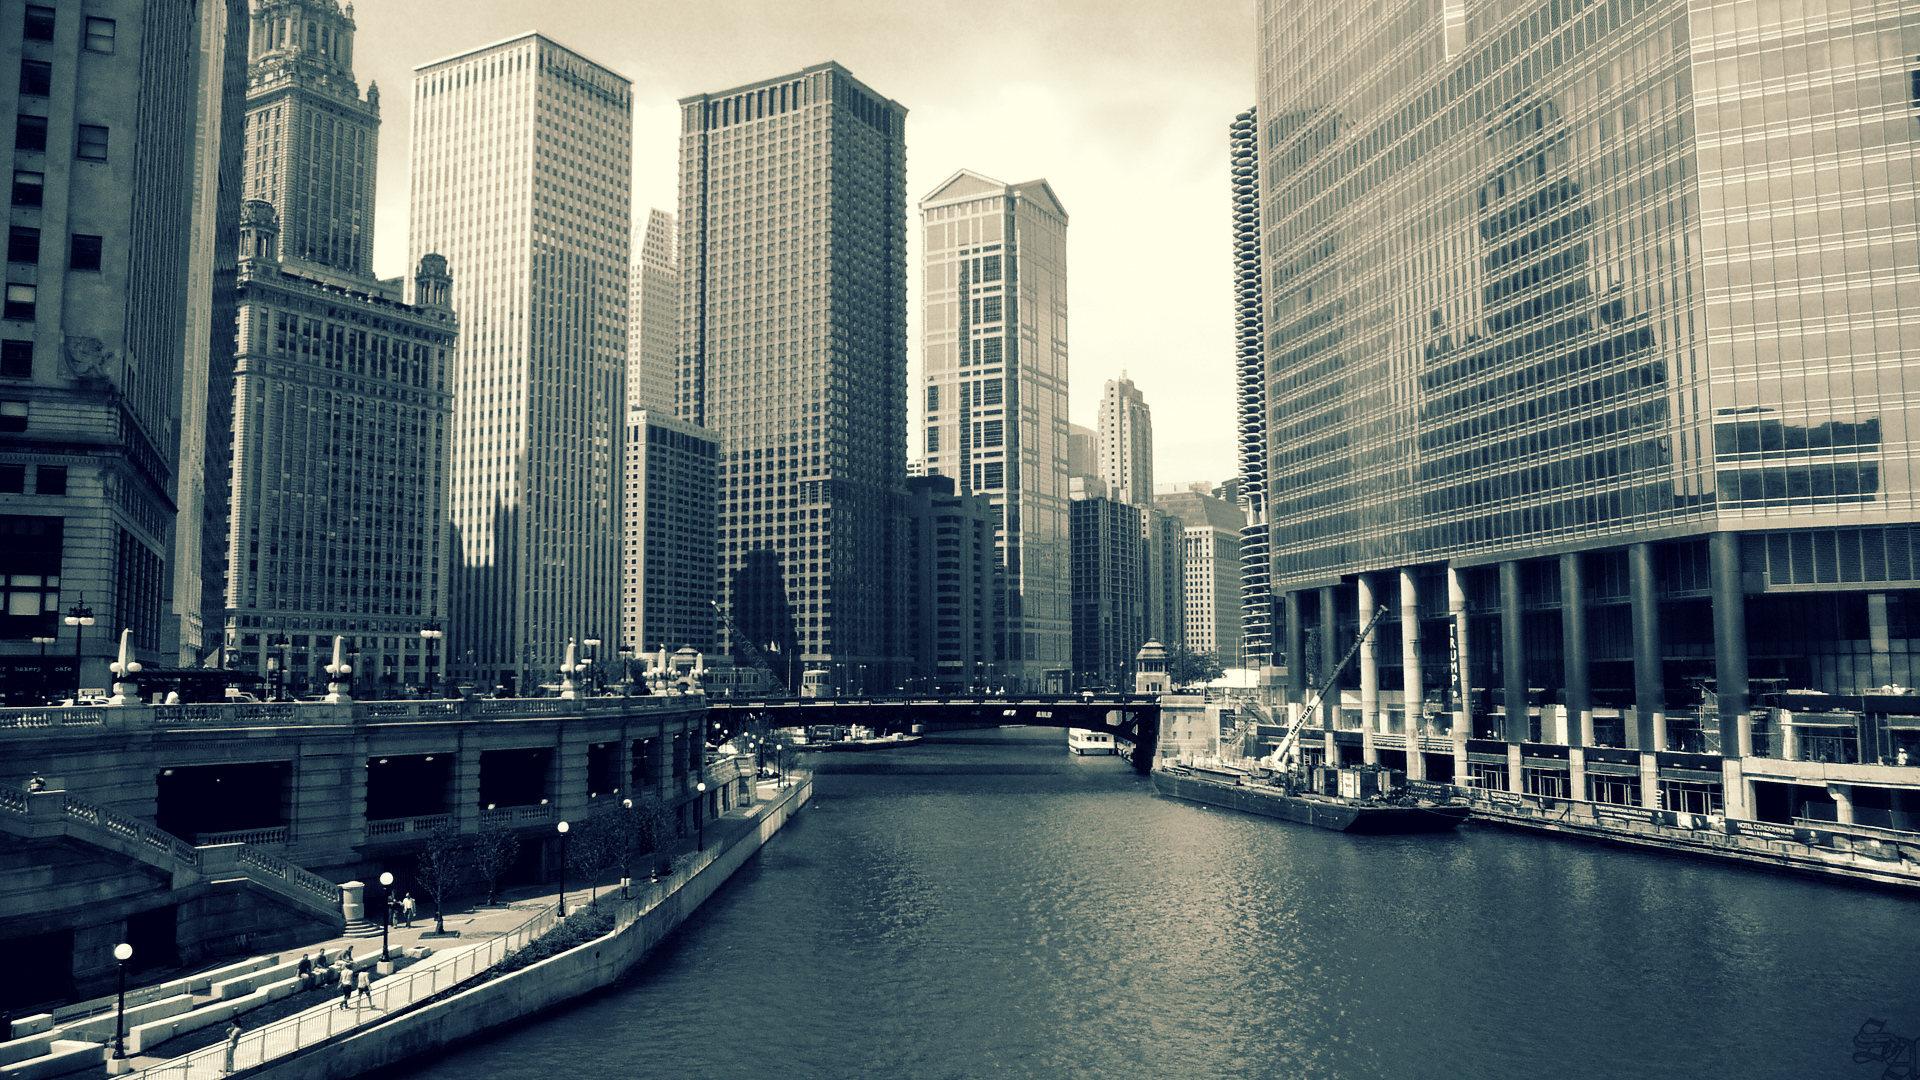 38 Wallpapers Of Chicago On Wallpapersafari